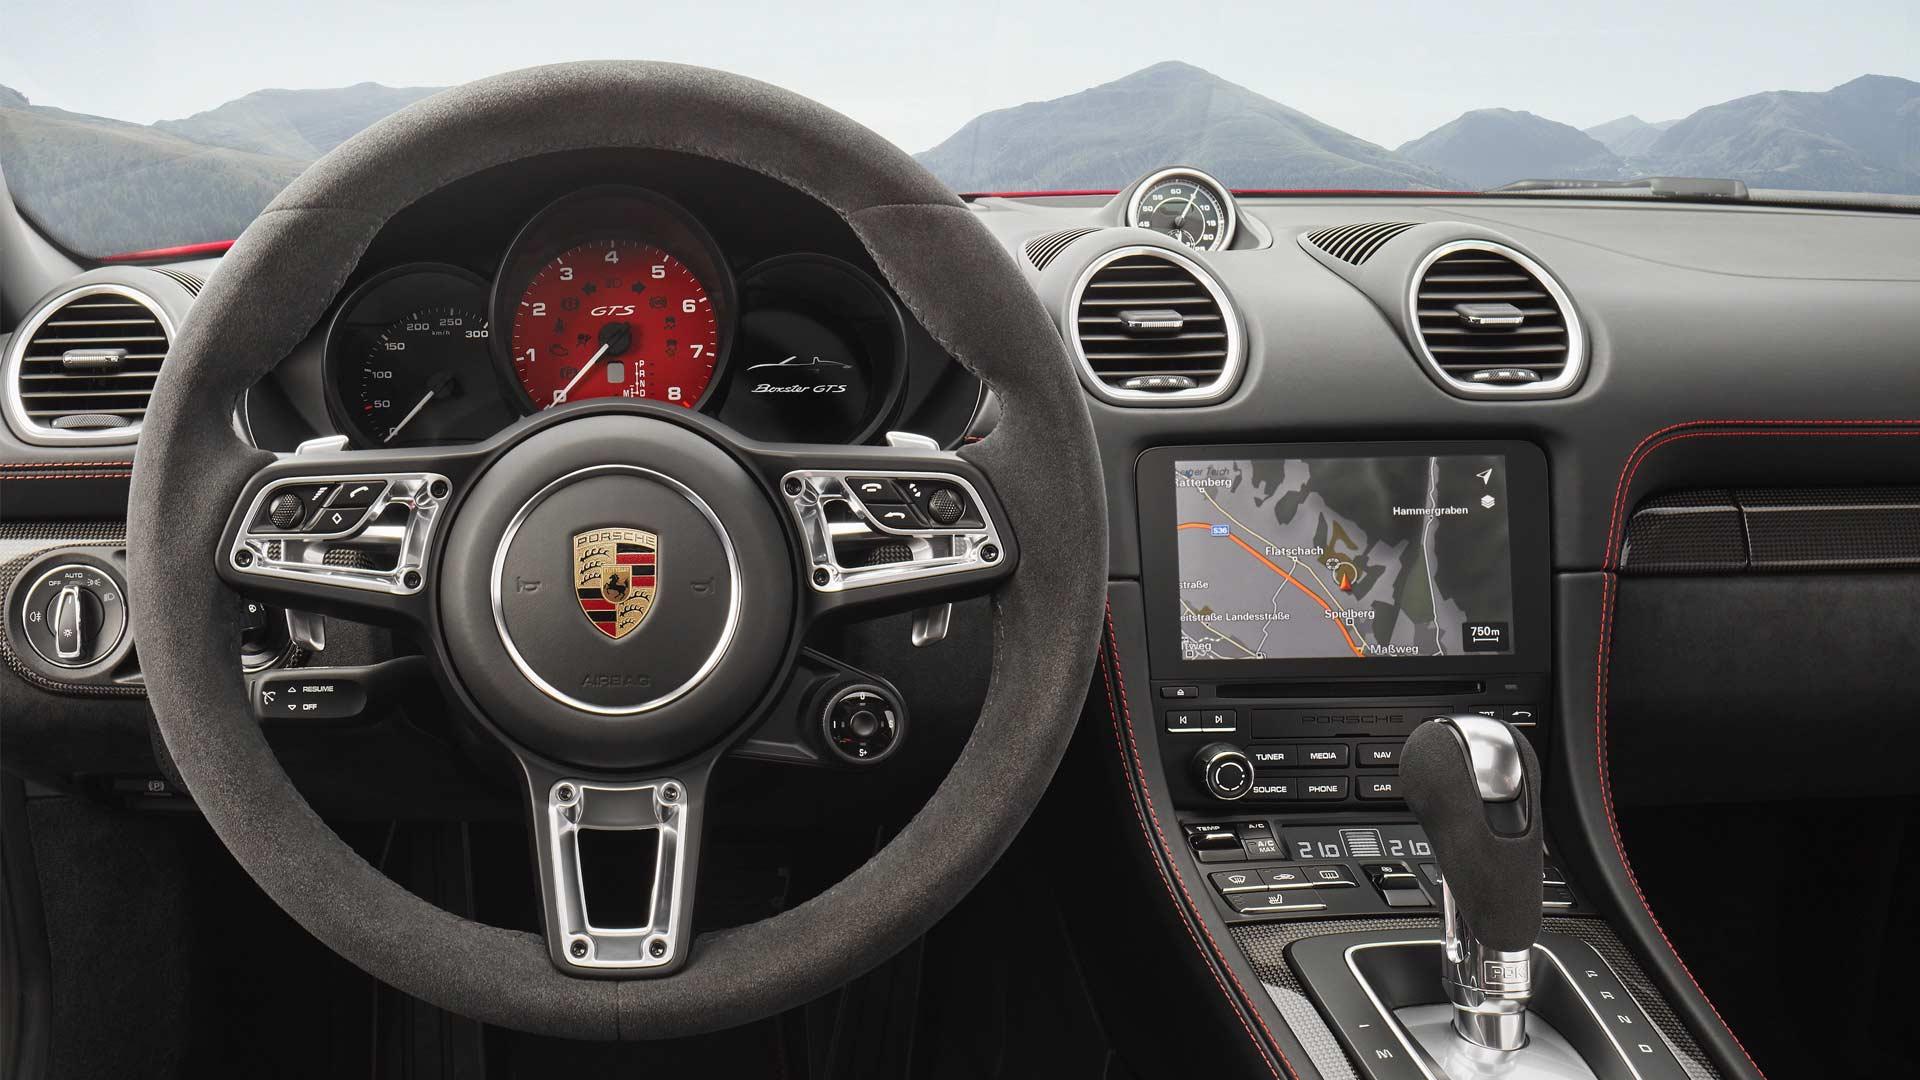 2018-New-Porsche-718-Cayman-GTS-718-Boxster-GTS-interior